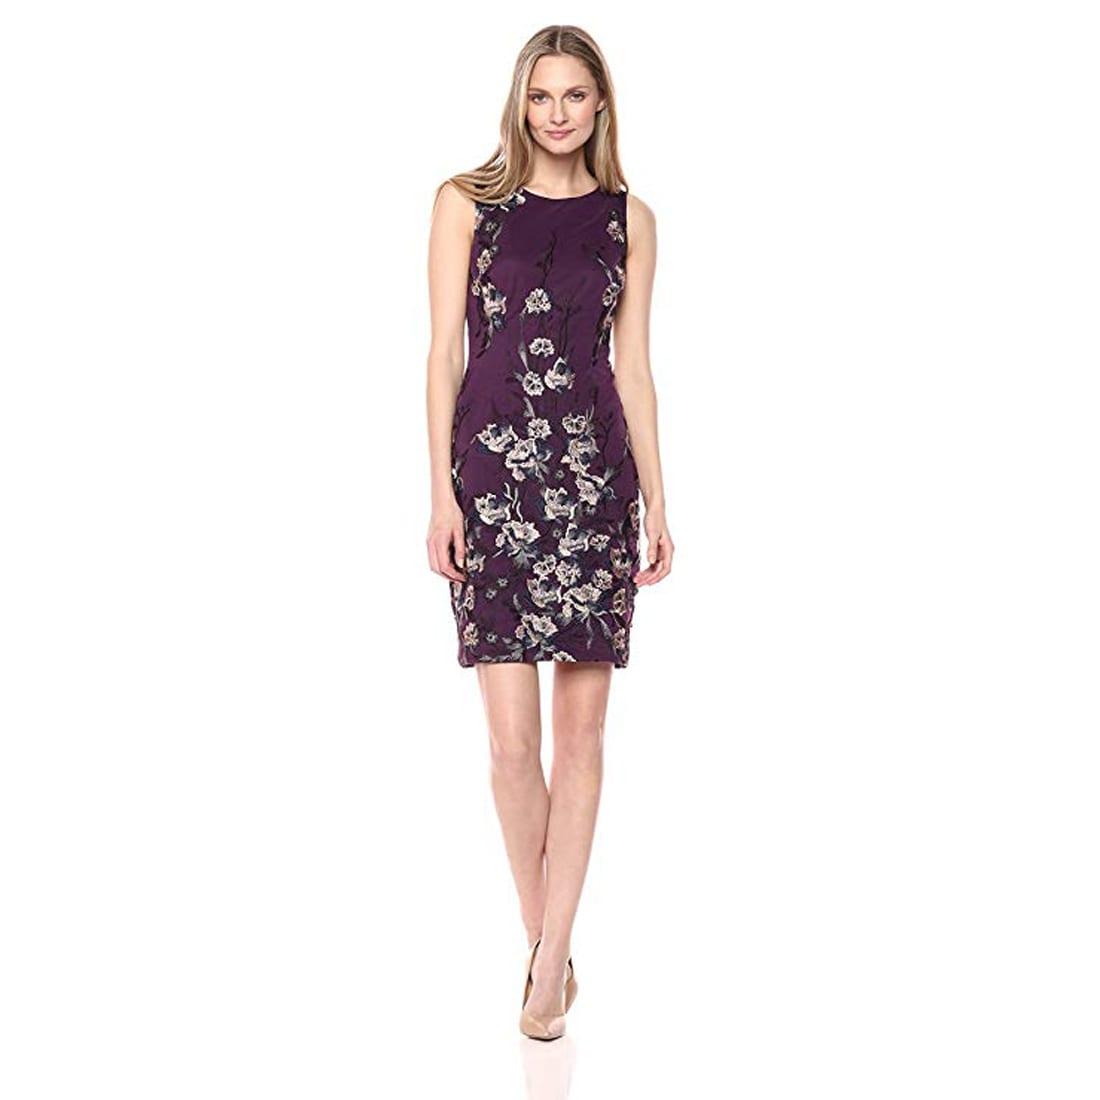 252af1de Ivanka Trump Dresses   Find Great Women's Clothing Deals Shopping at  Overstock